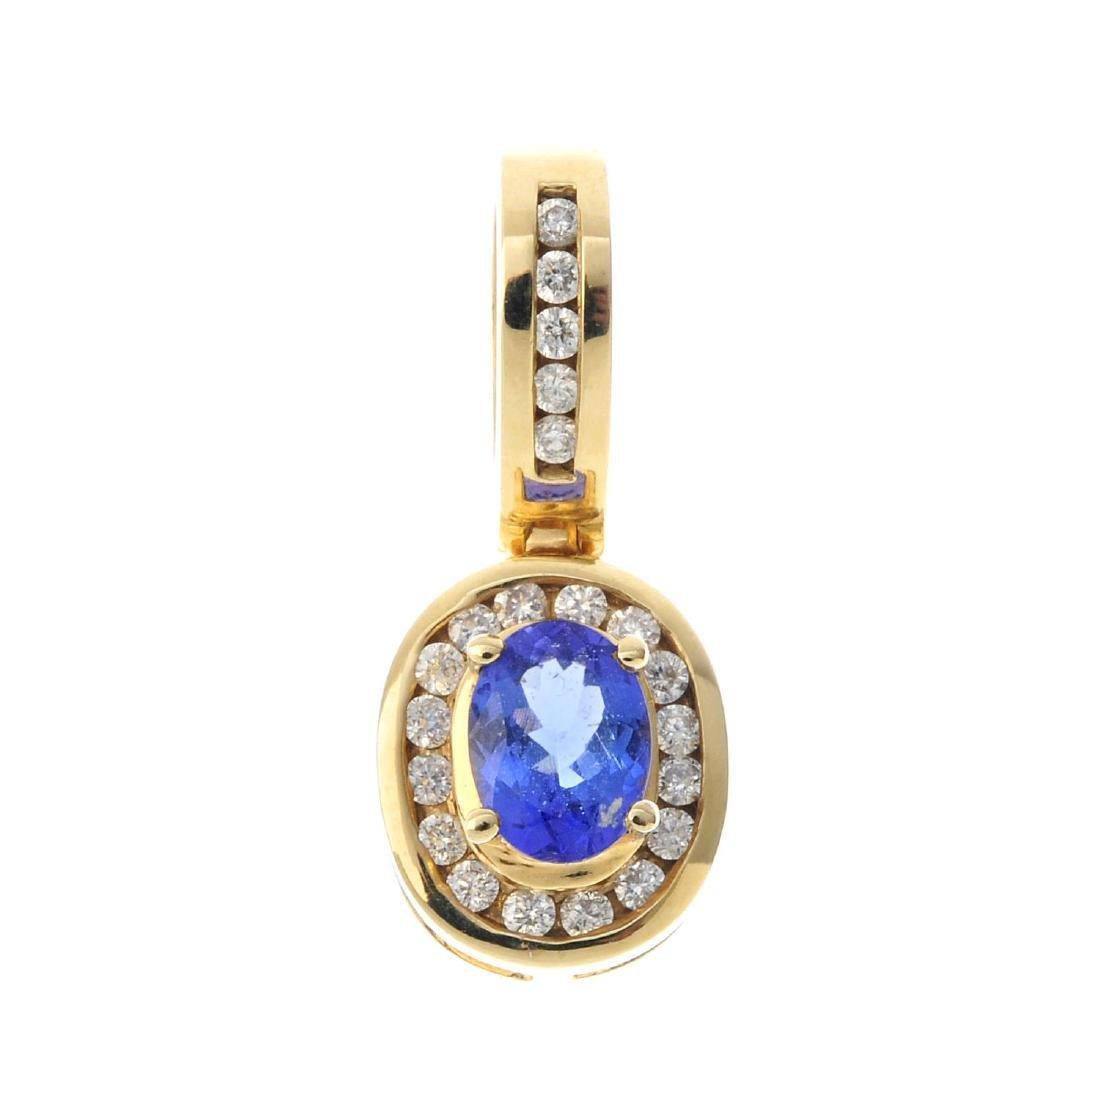 A tanzanite and diamond pendant. The oval-shape